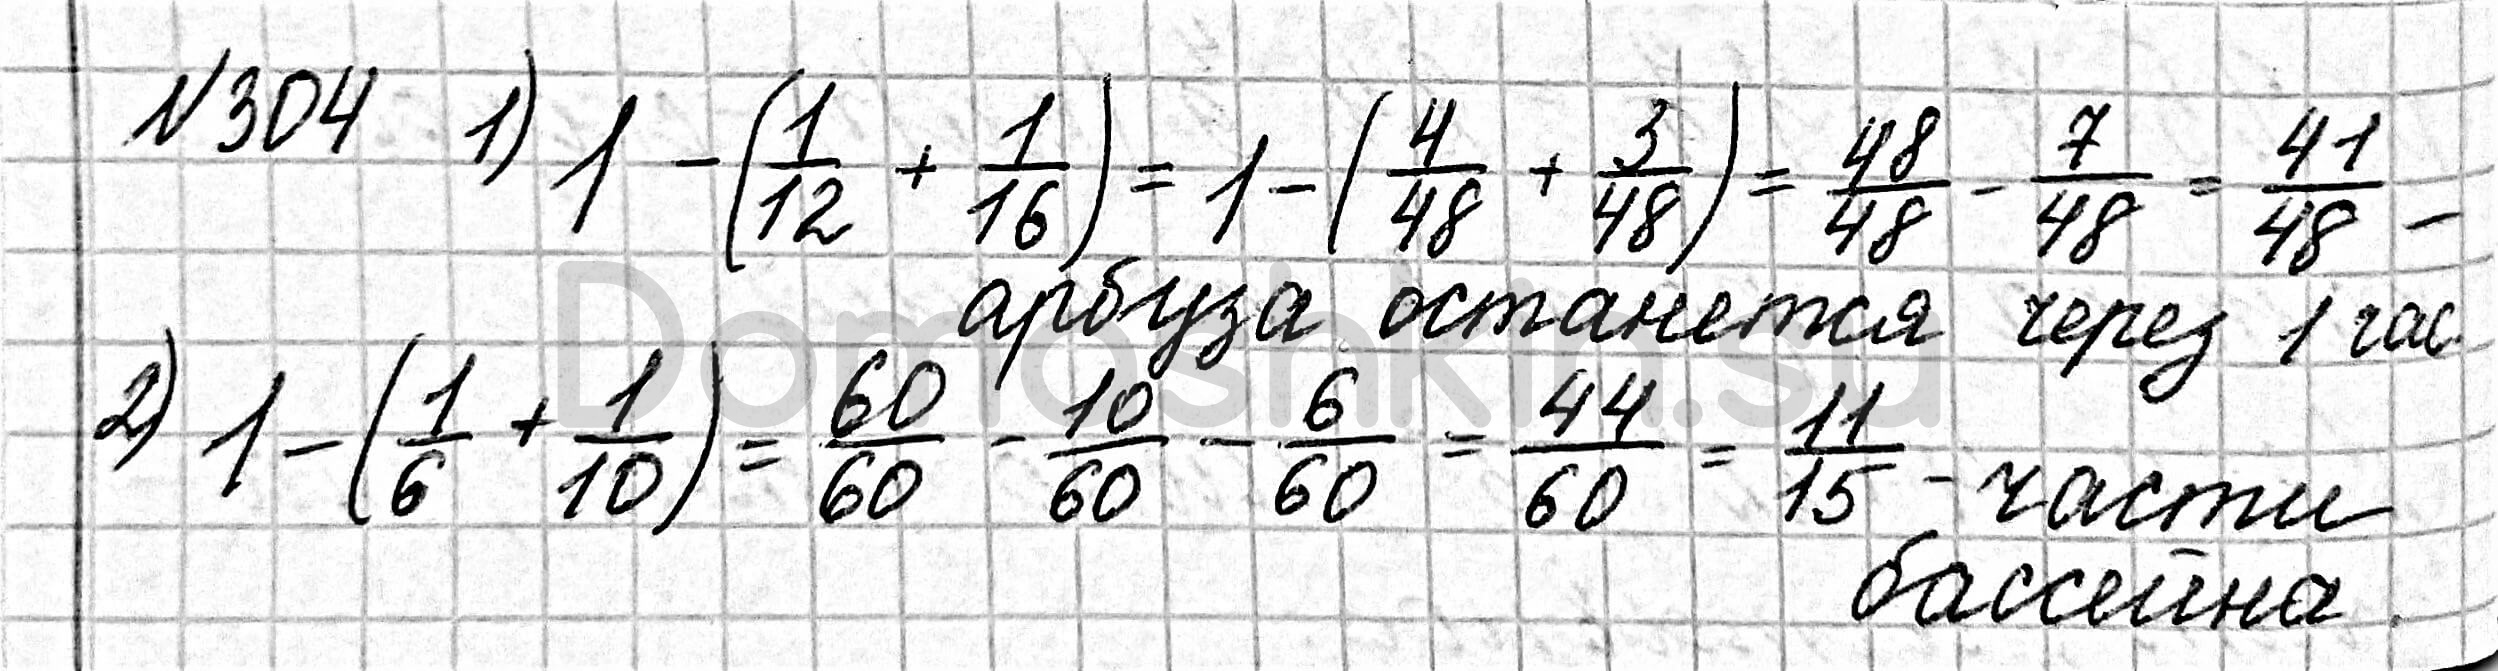 Математика 6 класс учебник Мерзляк номер 304 решение